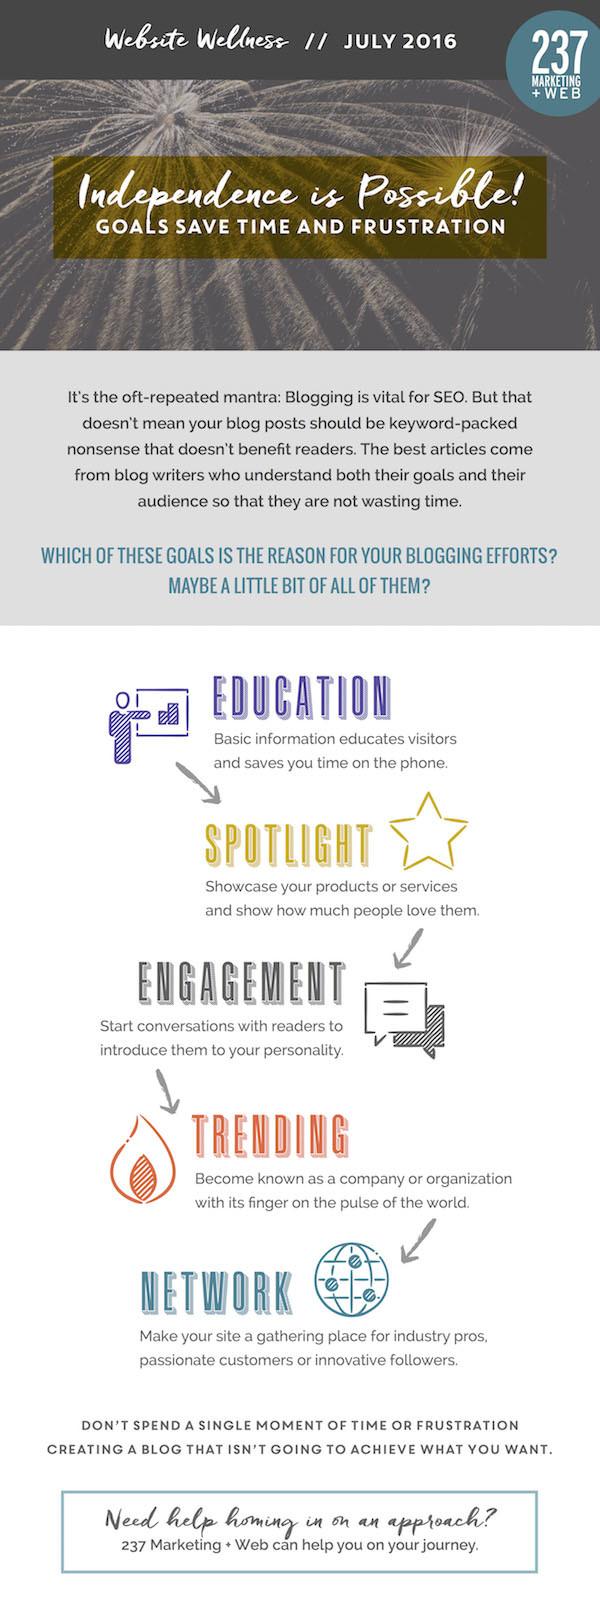 Goals Save Time and Frustration - Website Wellness • 237 Marketing + Web